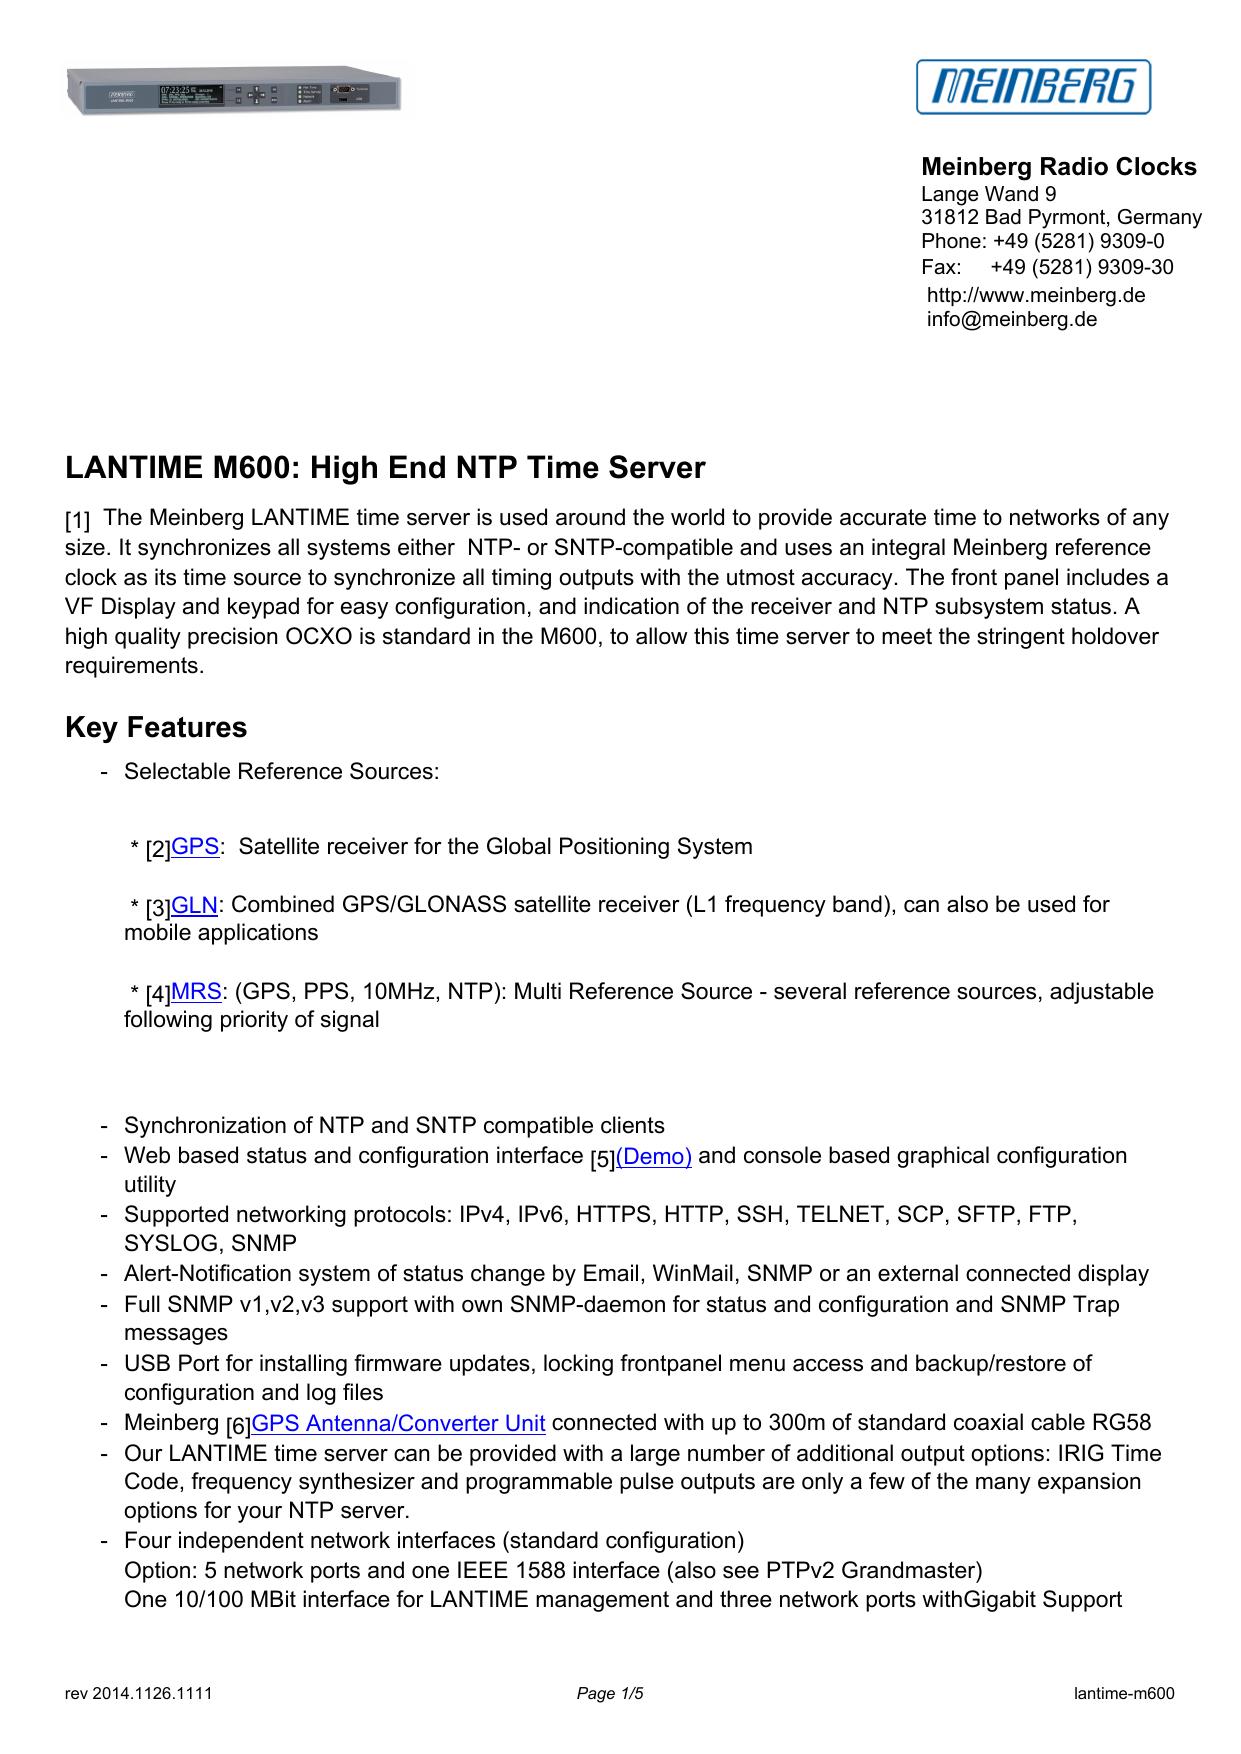 LANTIME M600: High End NTP Time Server   manualzz com